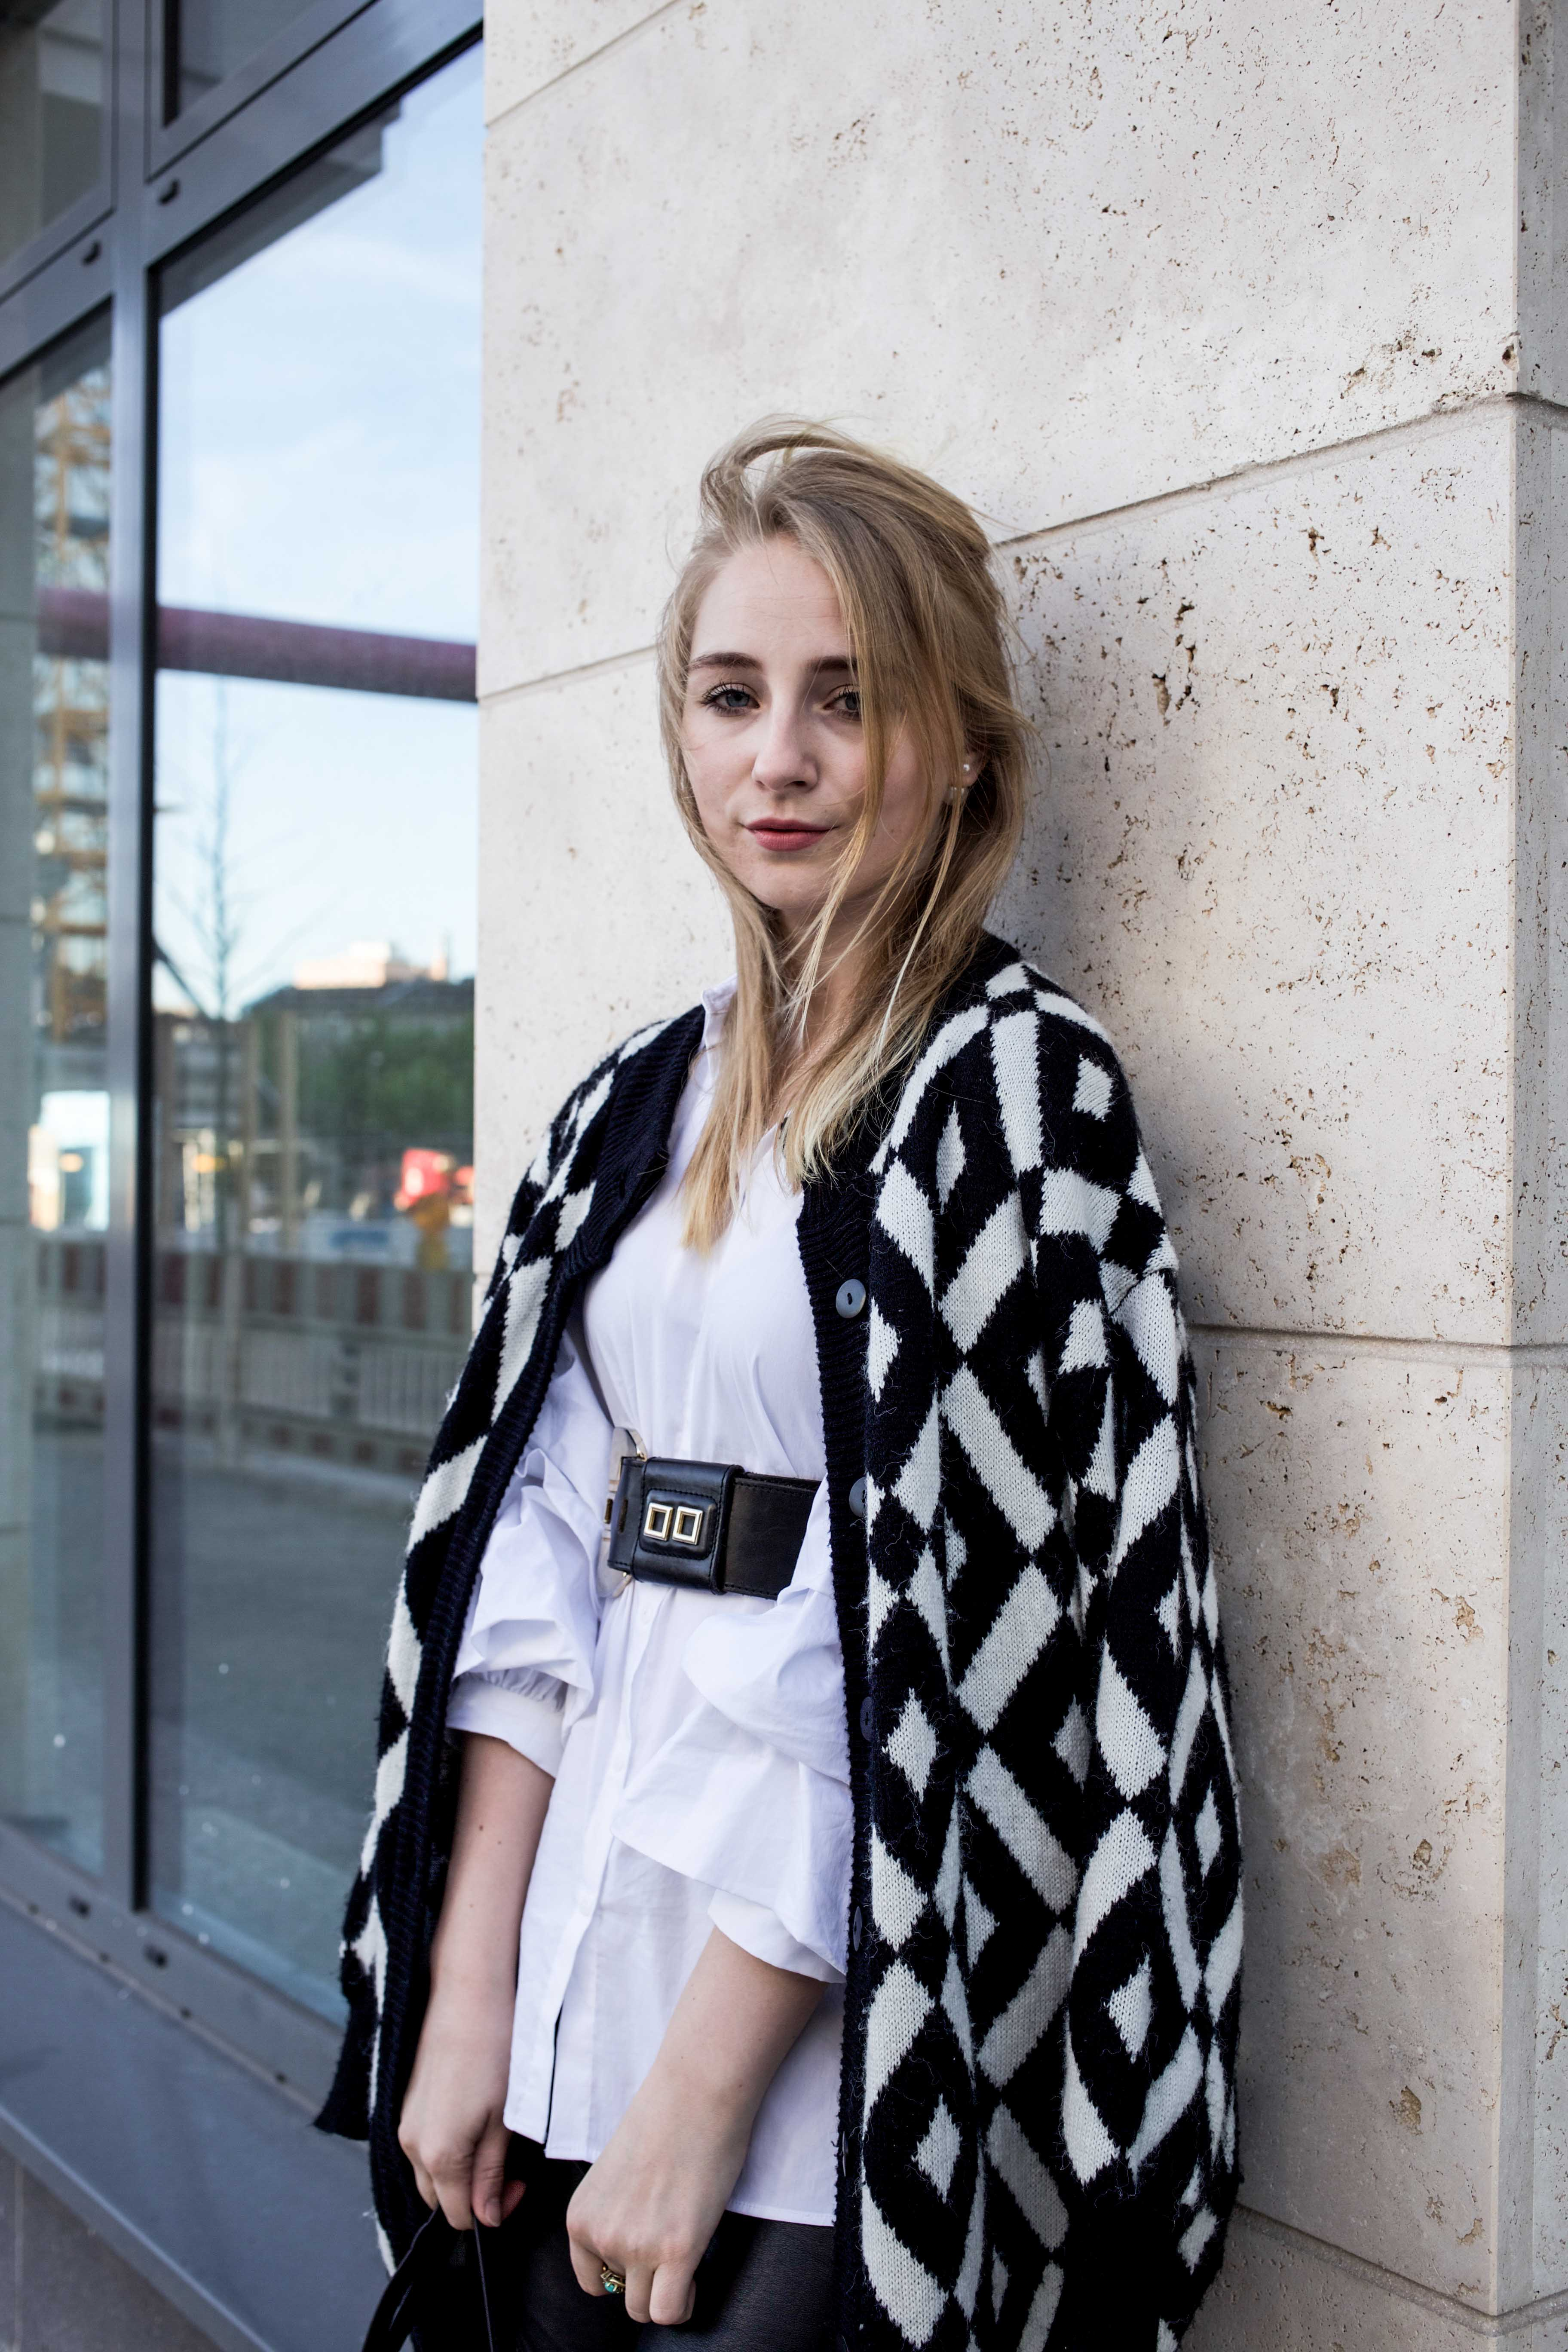 trendreport-weiße-bluse-trompetenärmel-fashionblog-ootd-modeblog-berlin_8825